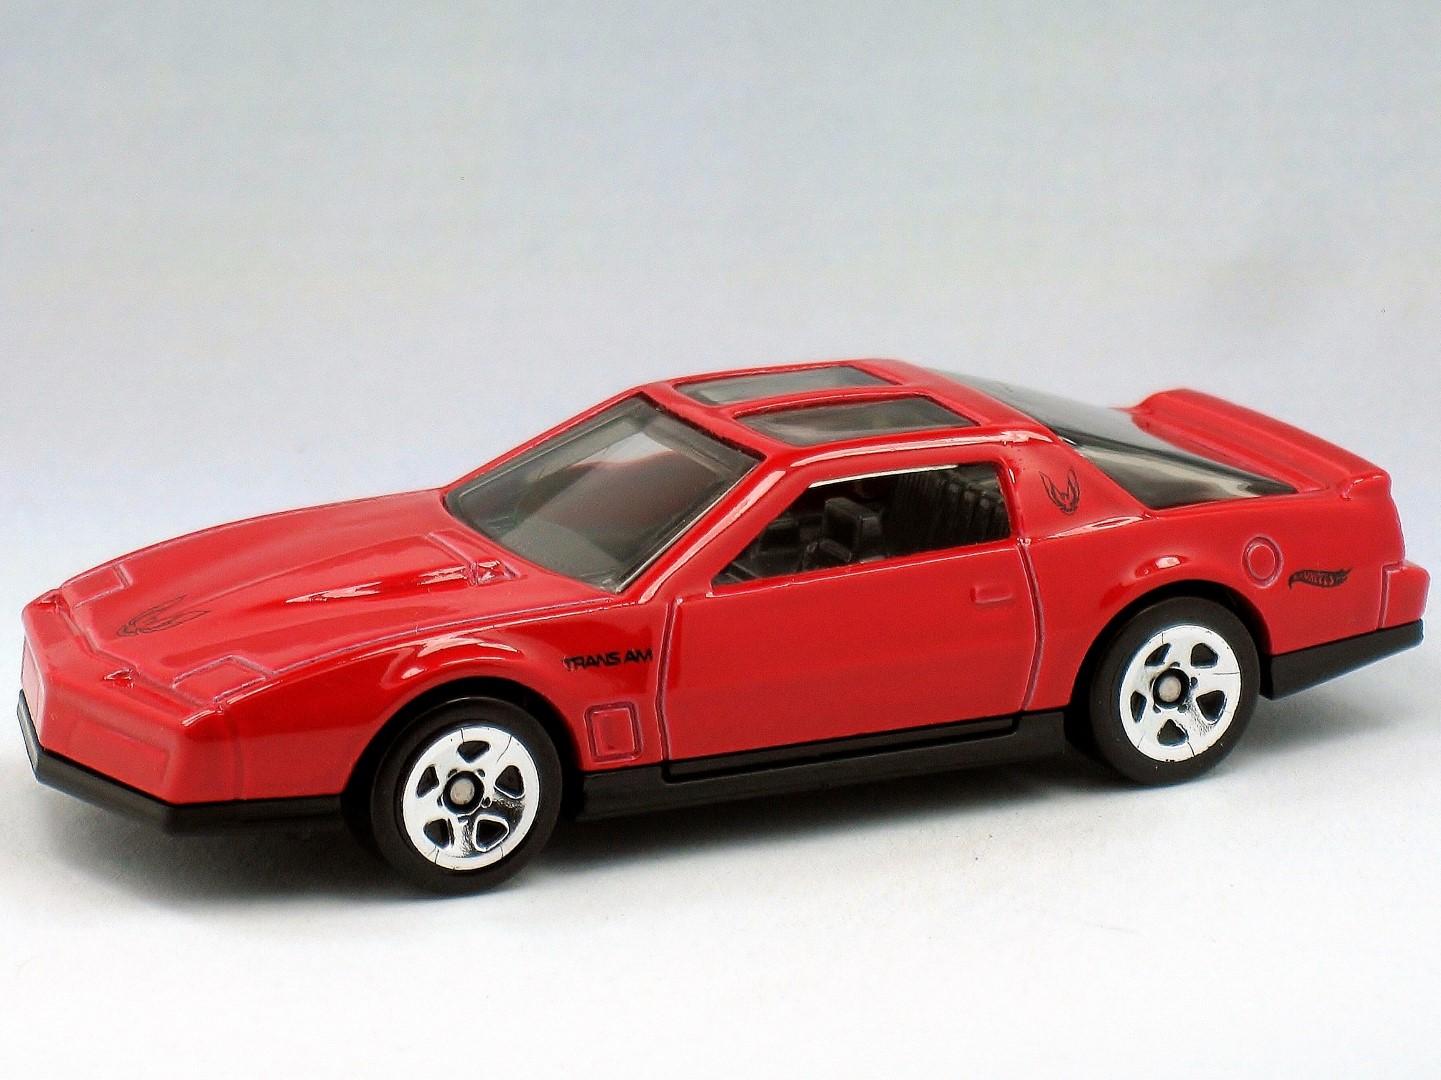 '84 Pontiac Firebird